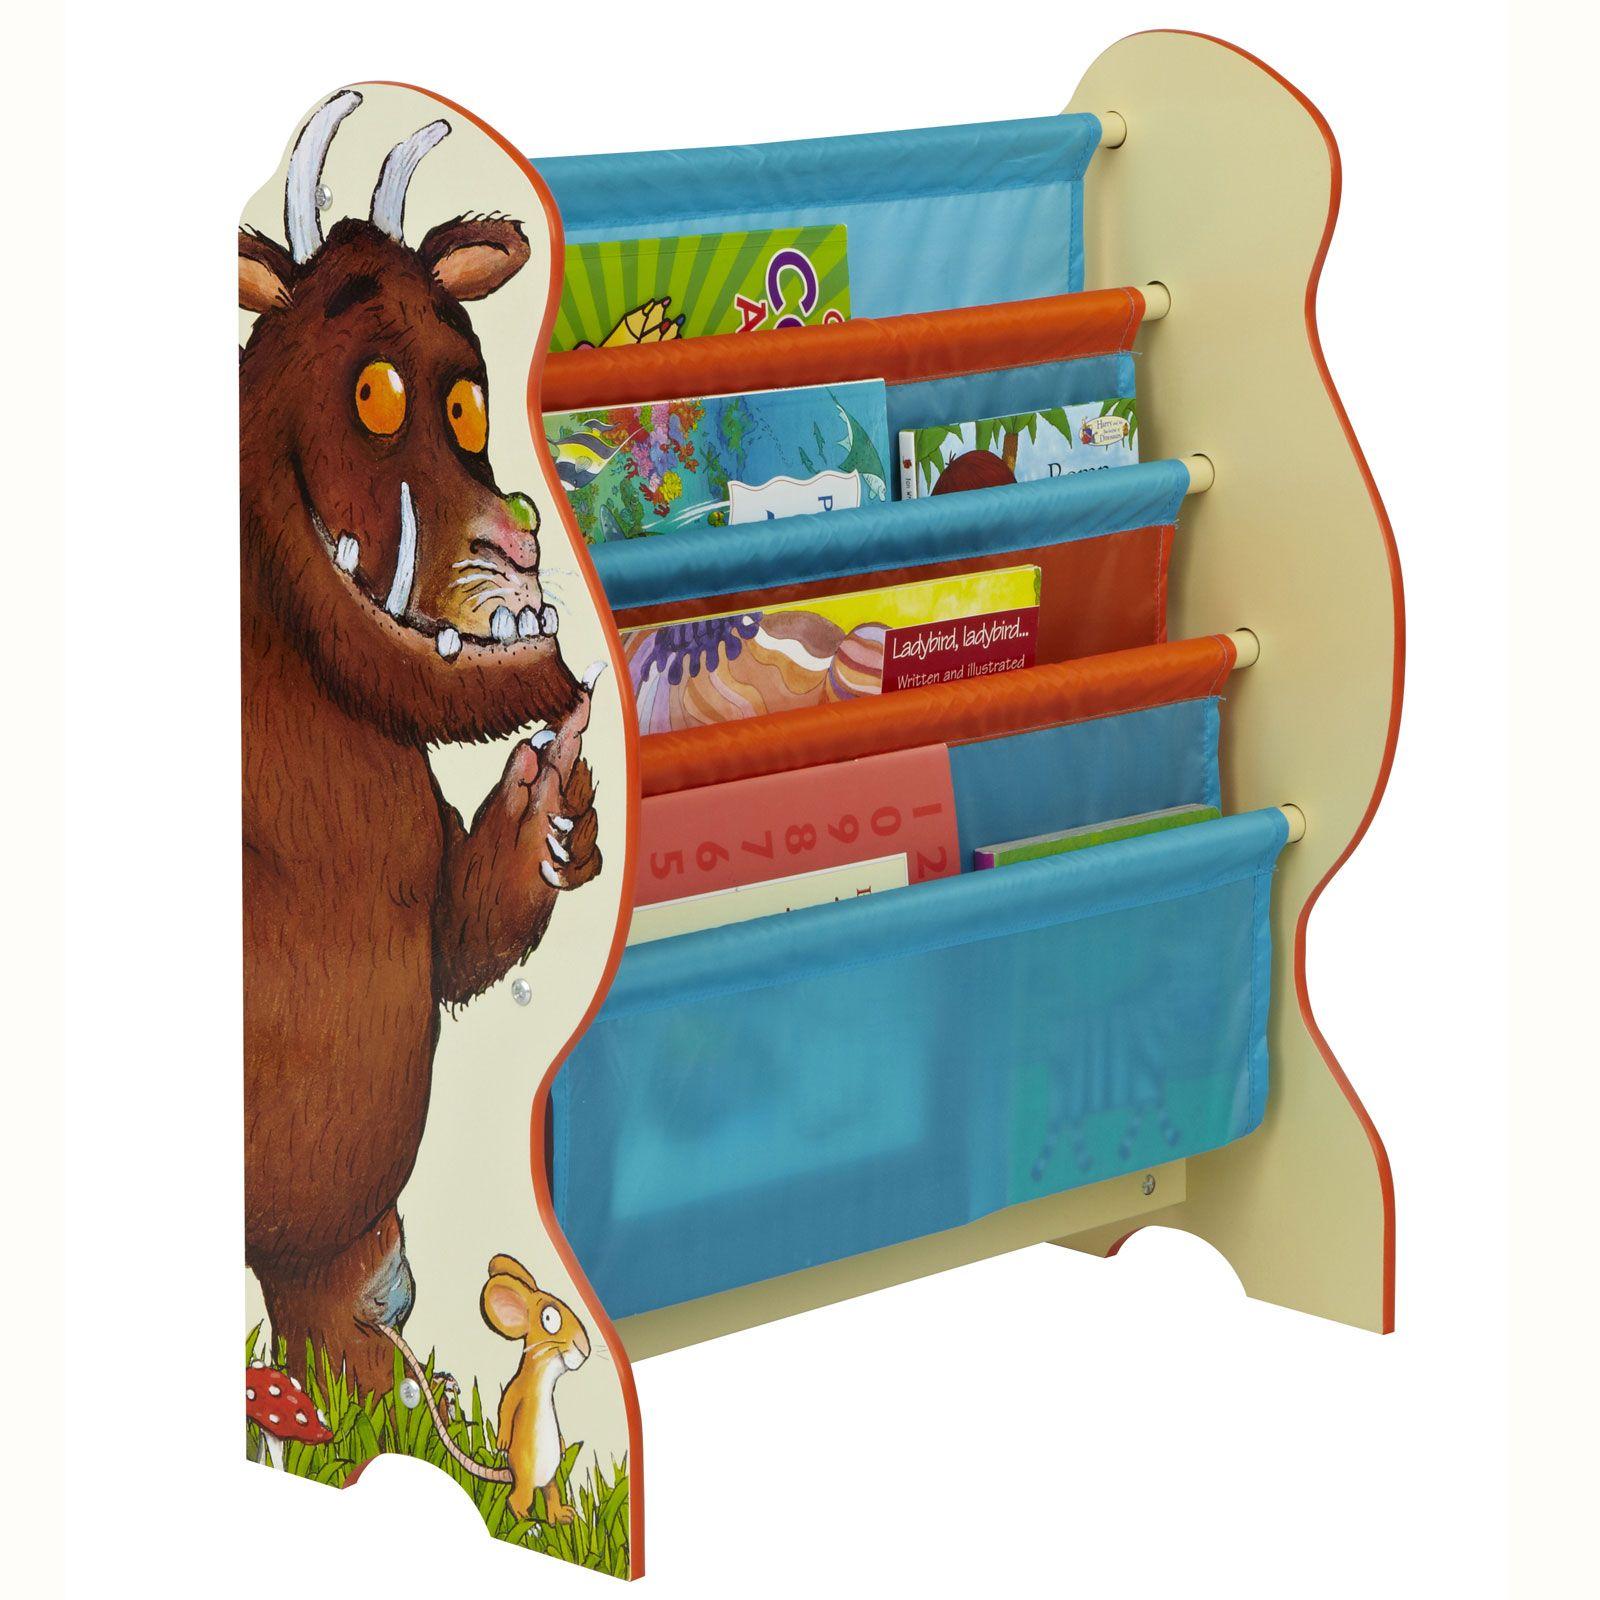 PERSONNAGE-Bibliotheque-Elingue-rangement-de-chambre-Peppa-Thomas-GRUFFALO